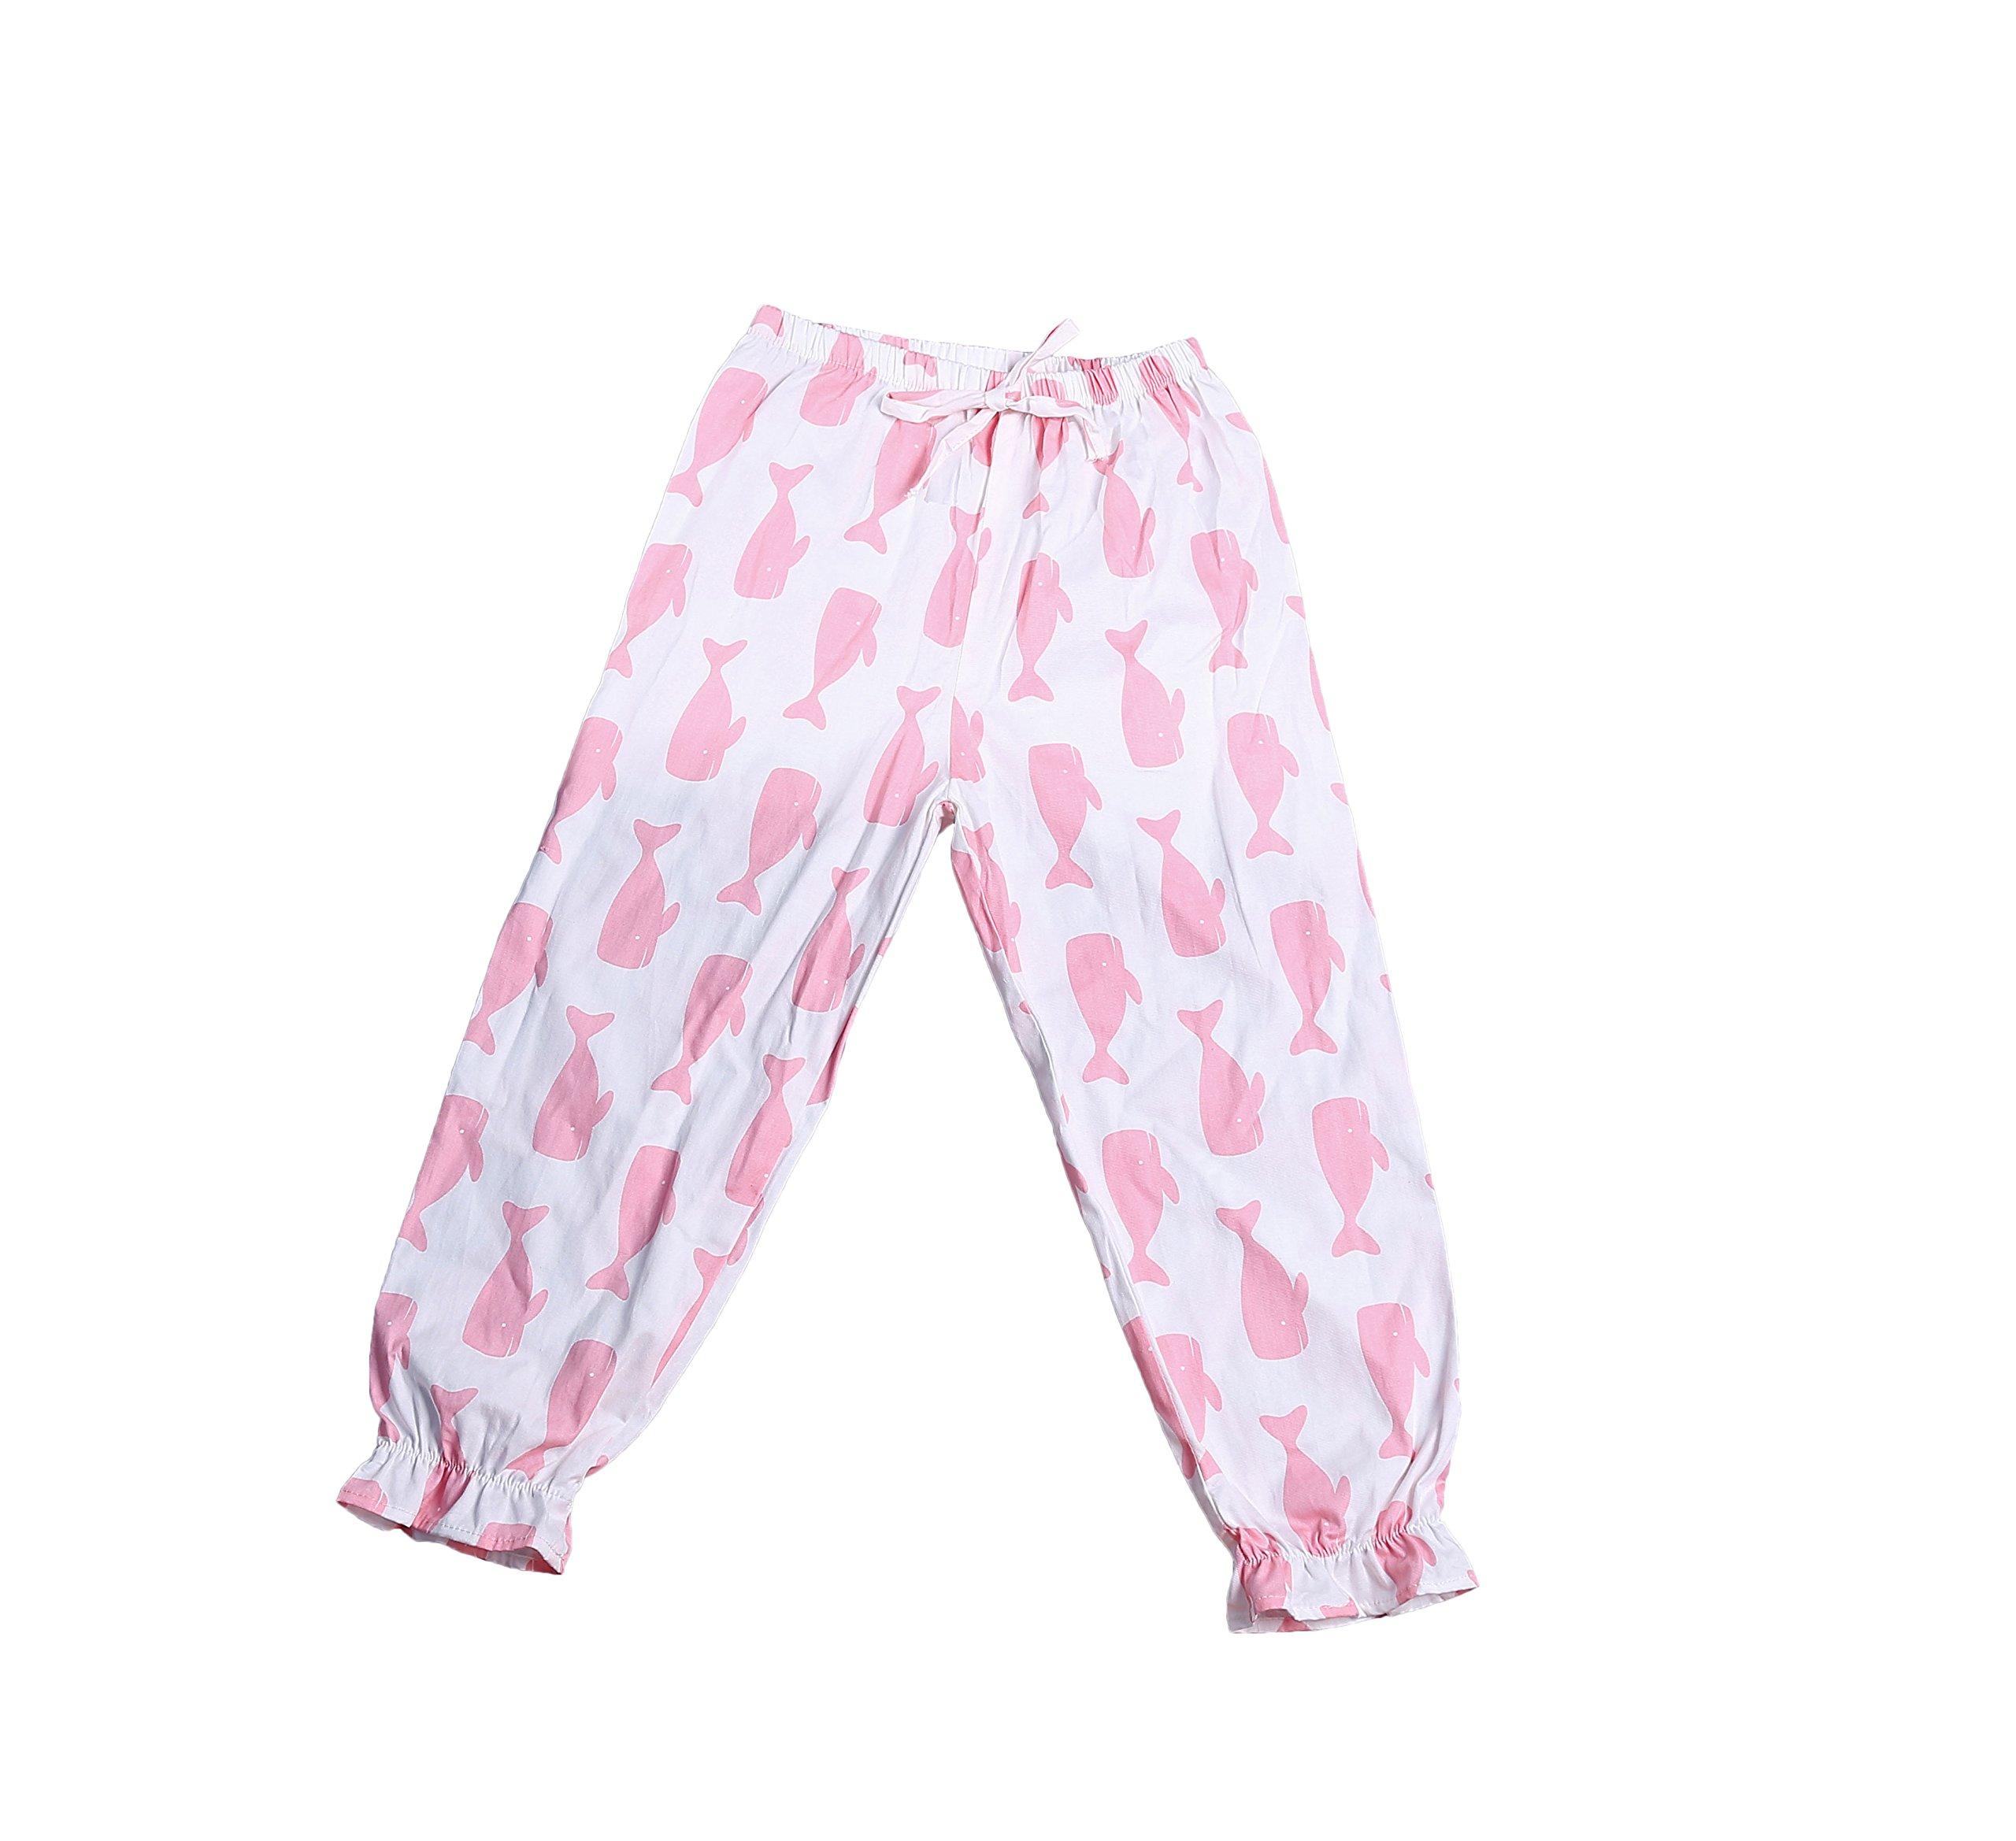 Zukzi Girls Summer Casual Cotton Mid Waist Long Pants with Pattern, Whale, 6-7 Years